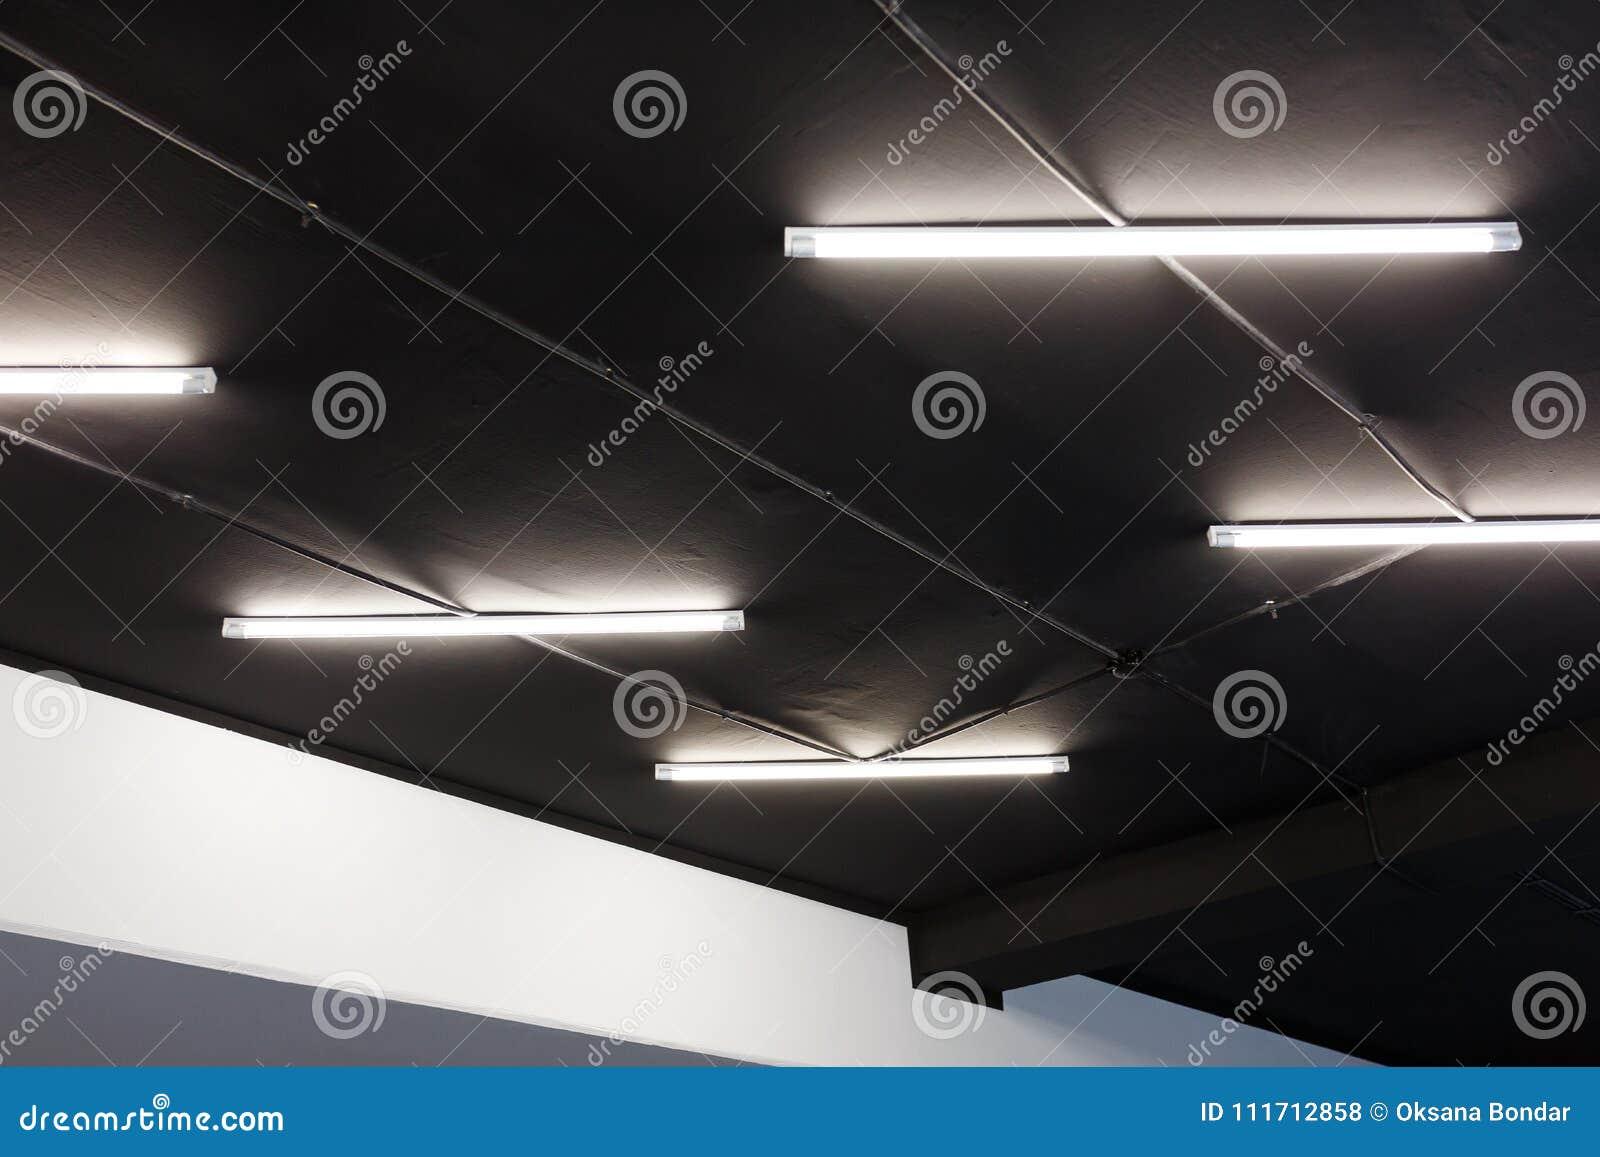 Led tube lights on black office ceiling. Minimal loft design